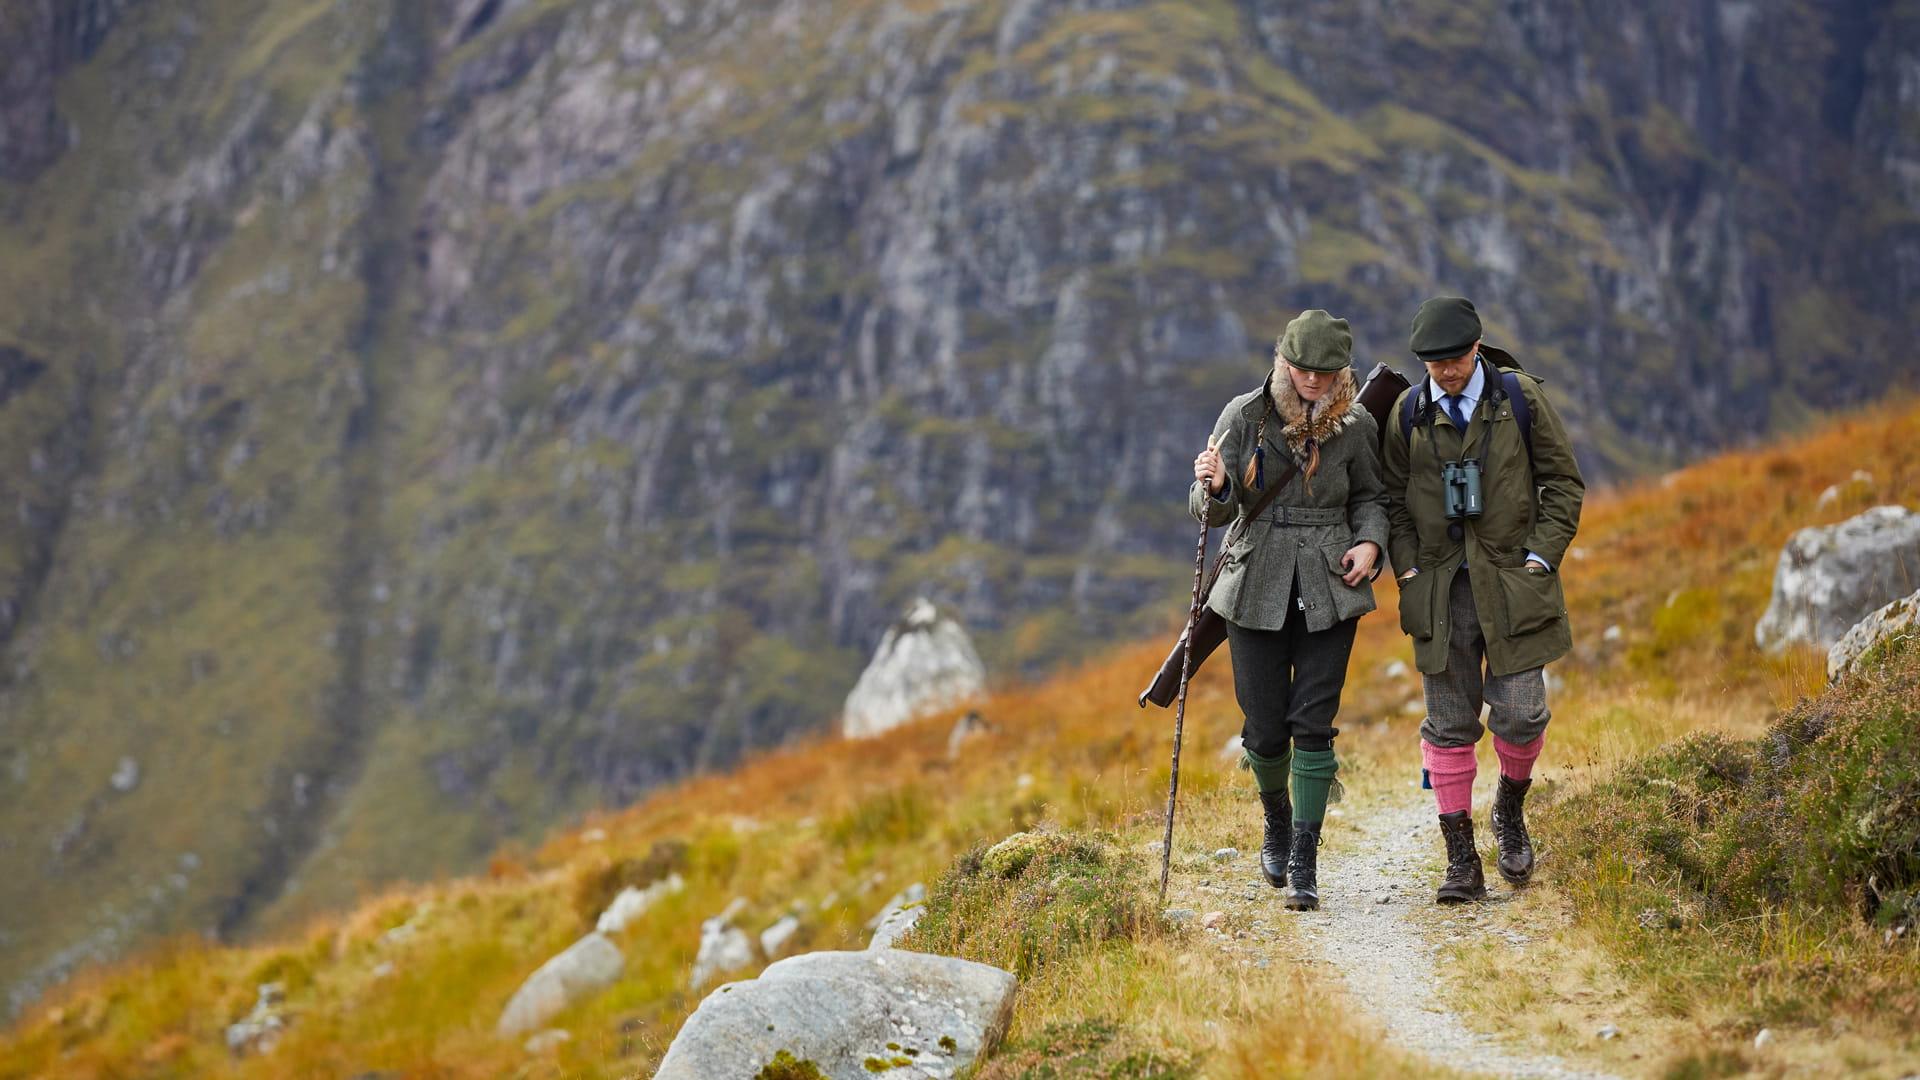 Letterewe-Estate - Lodges for rent in Scotland